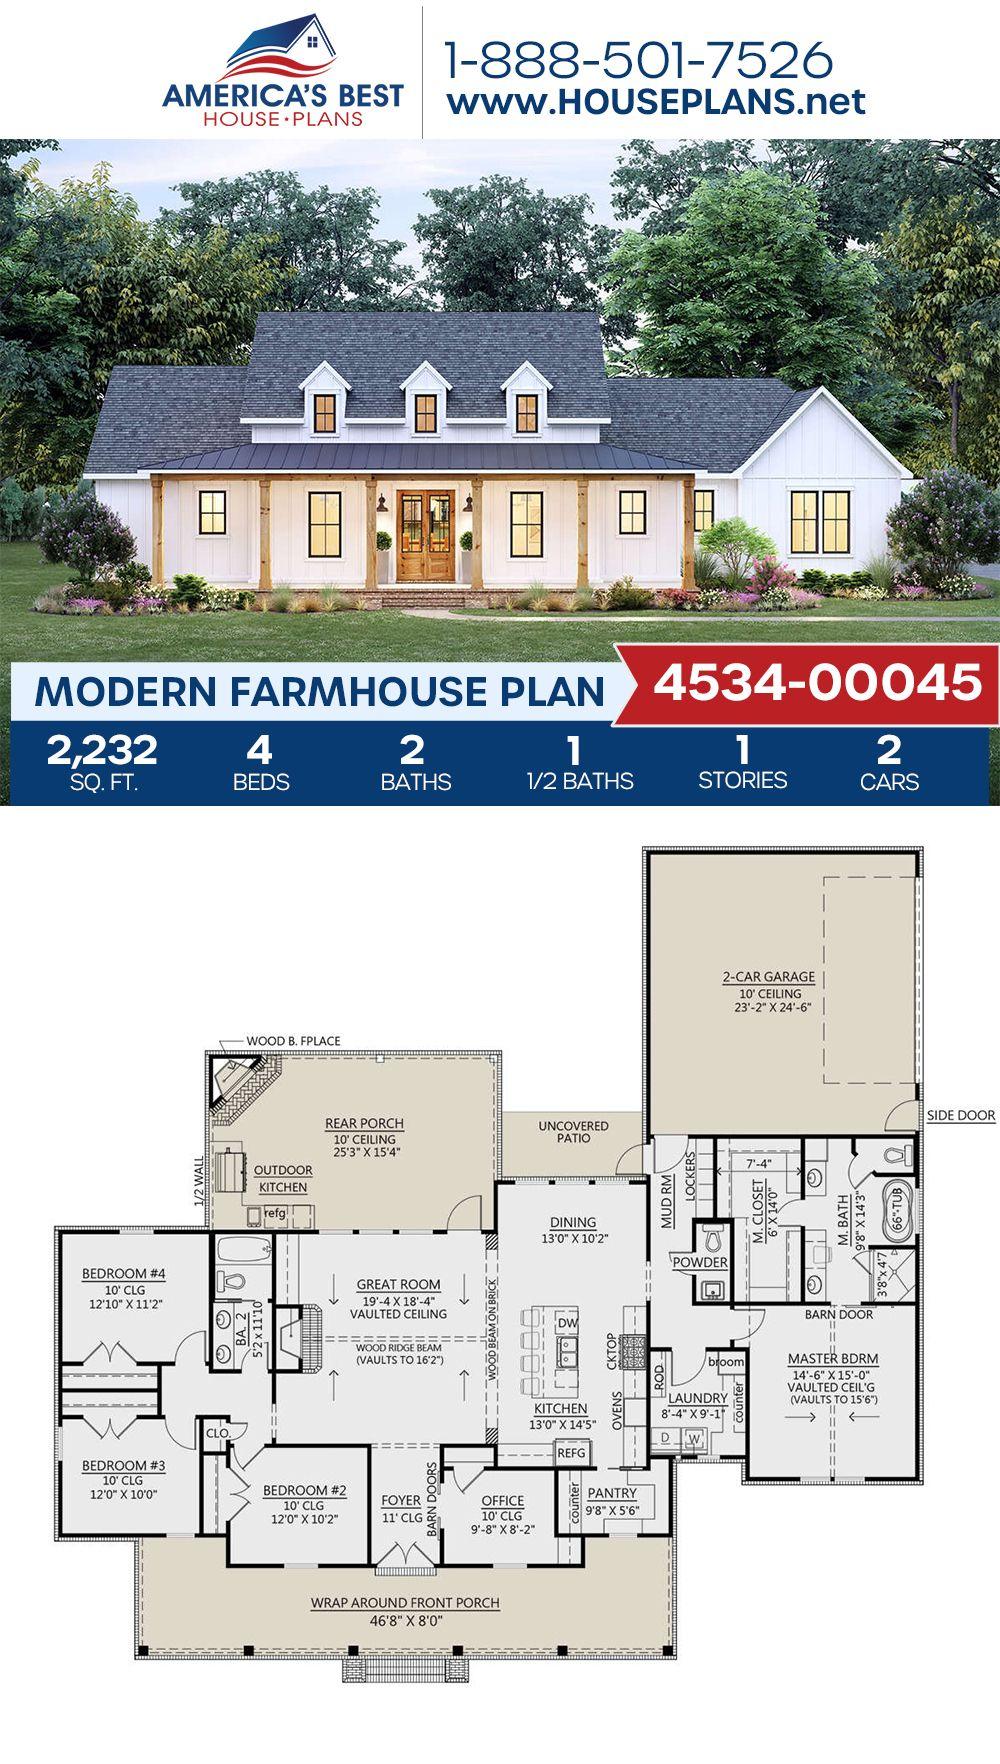 House Plan 4534 00045 Modern Farmhouse Plan 2 232 Square Feet 4 Bedrooms 2 5 Bathrooms Family House Plans Modern Farmhouse Plans Farmhouse Plans